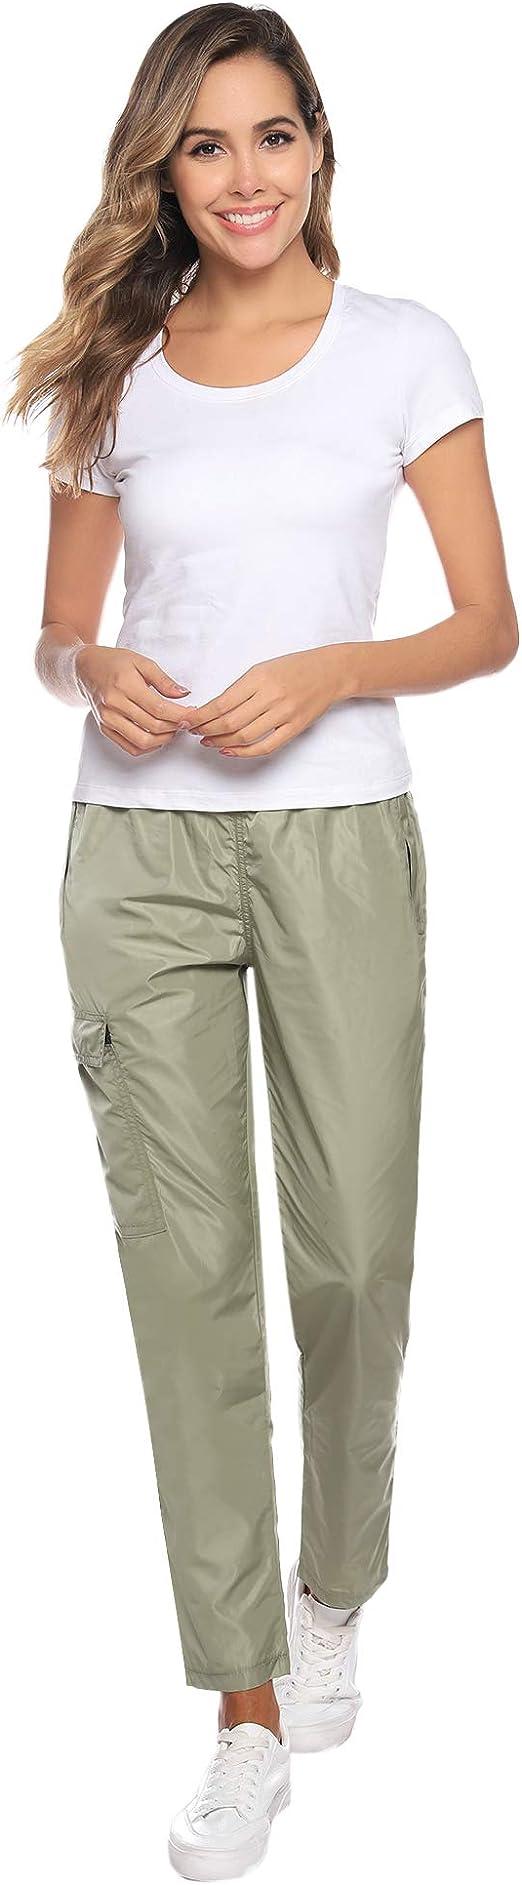 Abollria Unisex Outdoor Lightweight Hiking Waterproof Rain Pant Quick Dry Pants for Men//Women